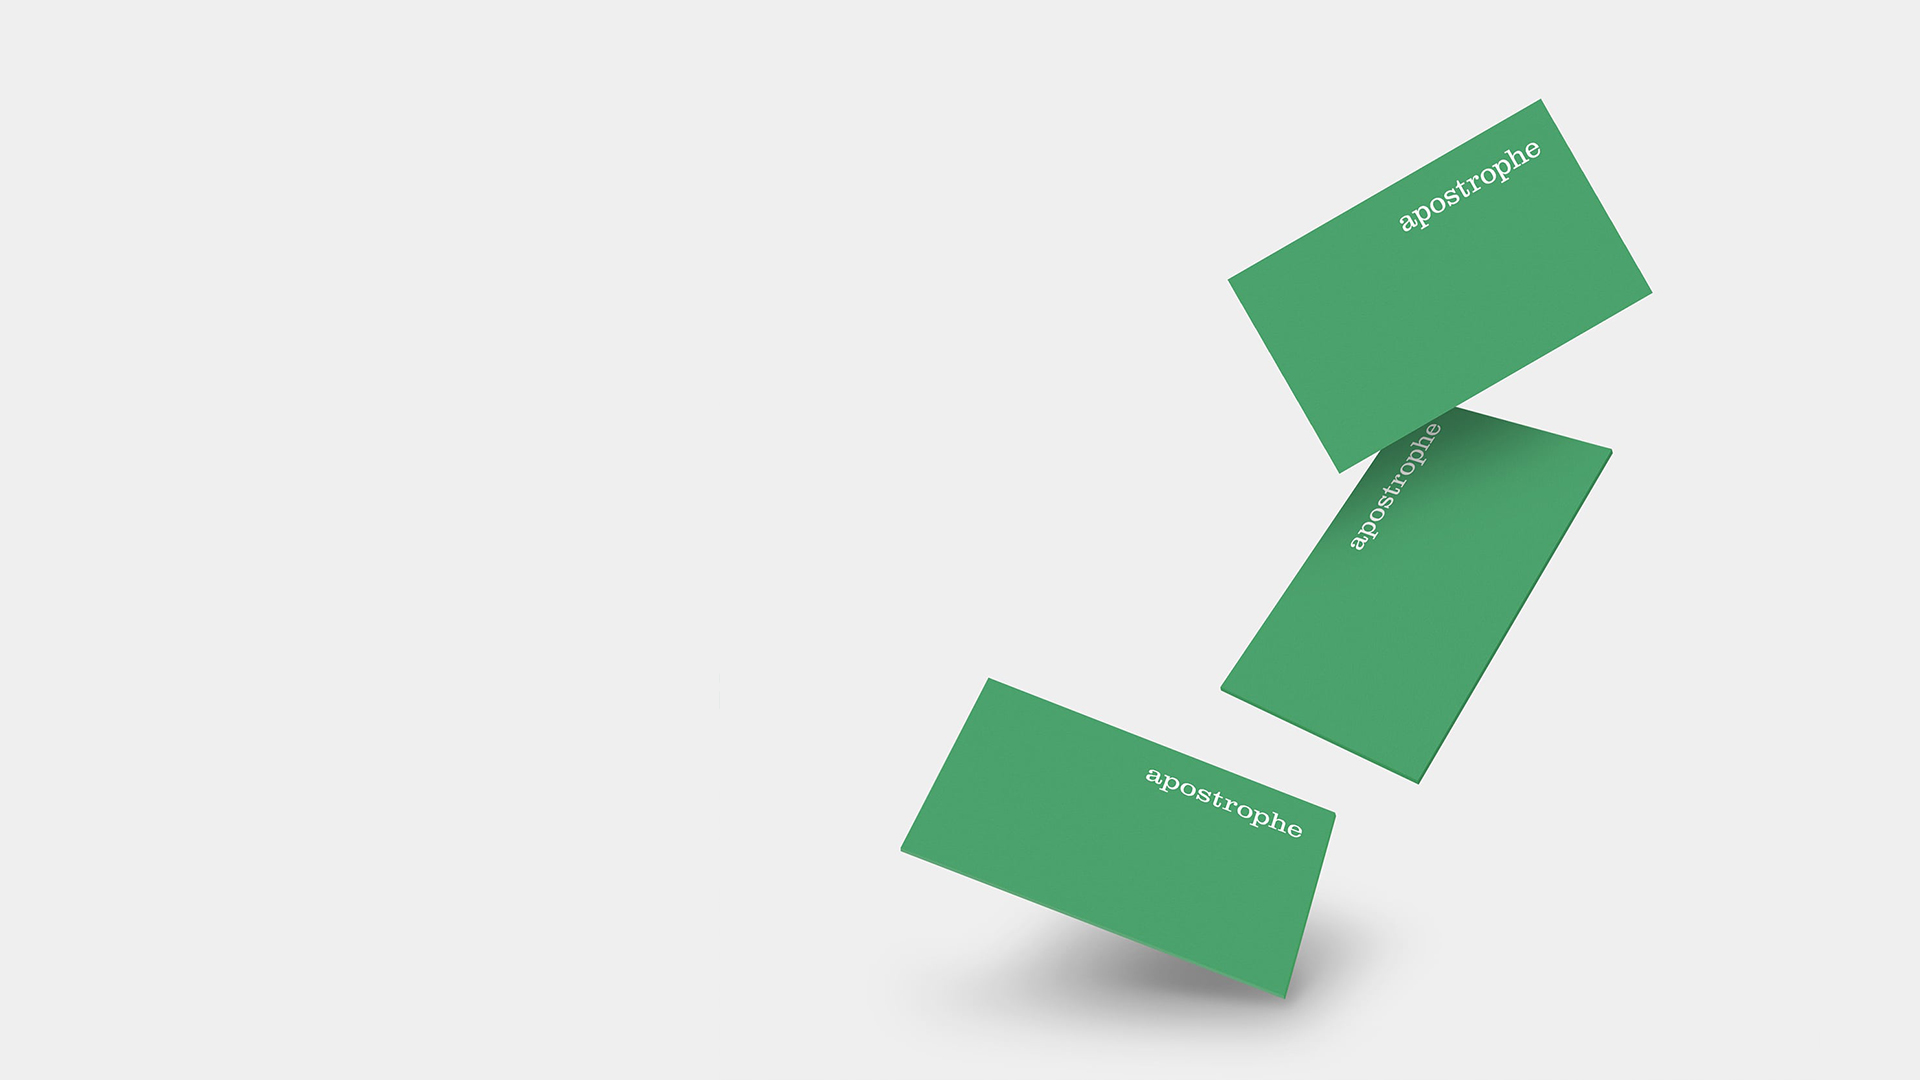 Apostrophe business card design